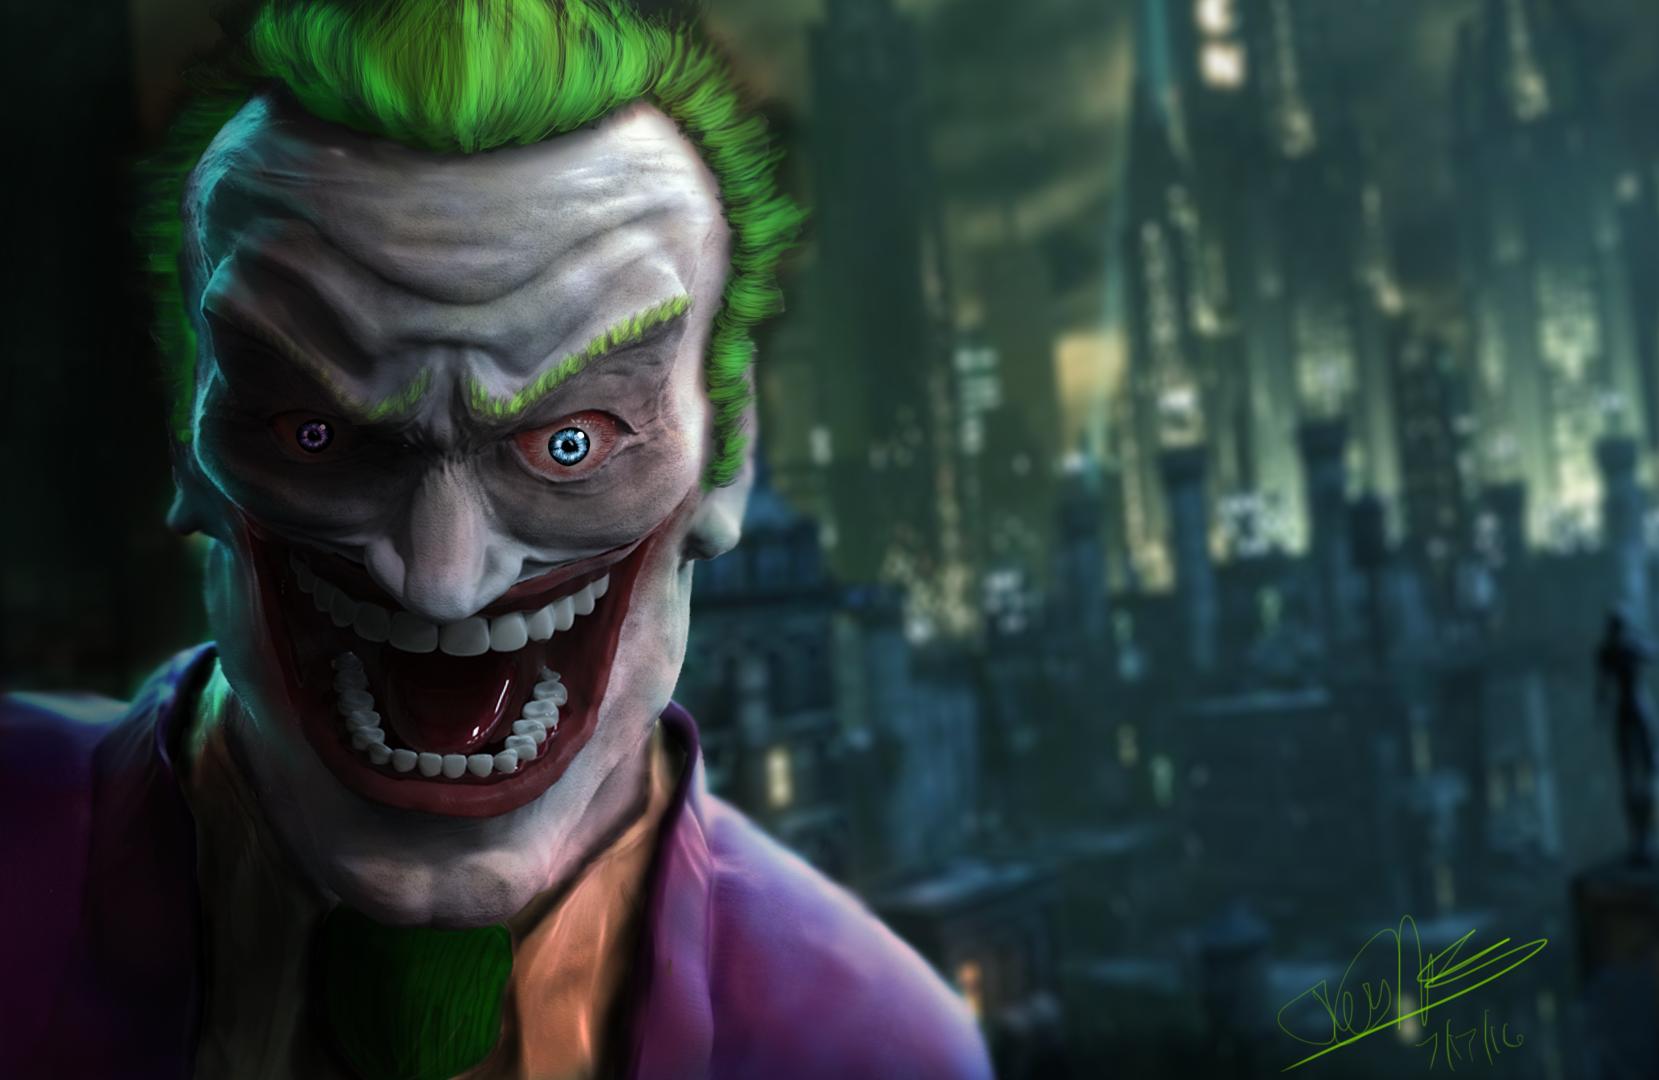 Joker! HAhaHAhaAhahaha